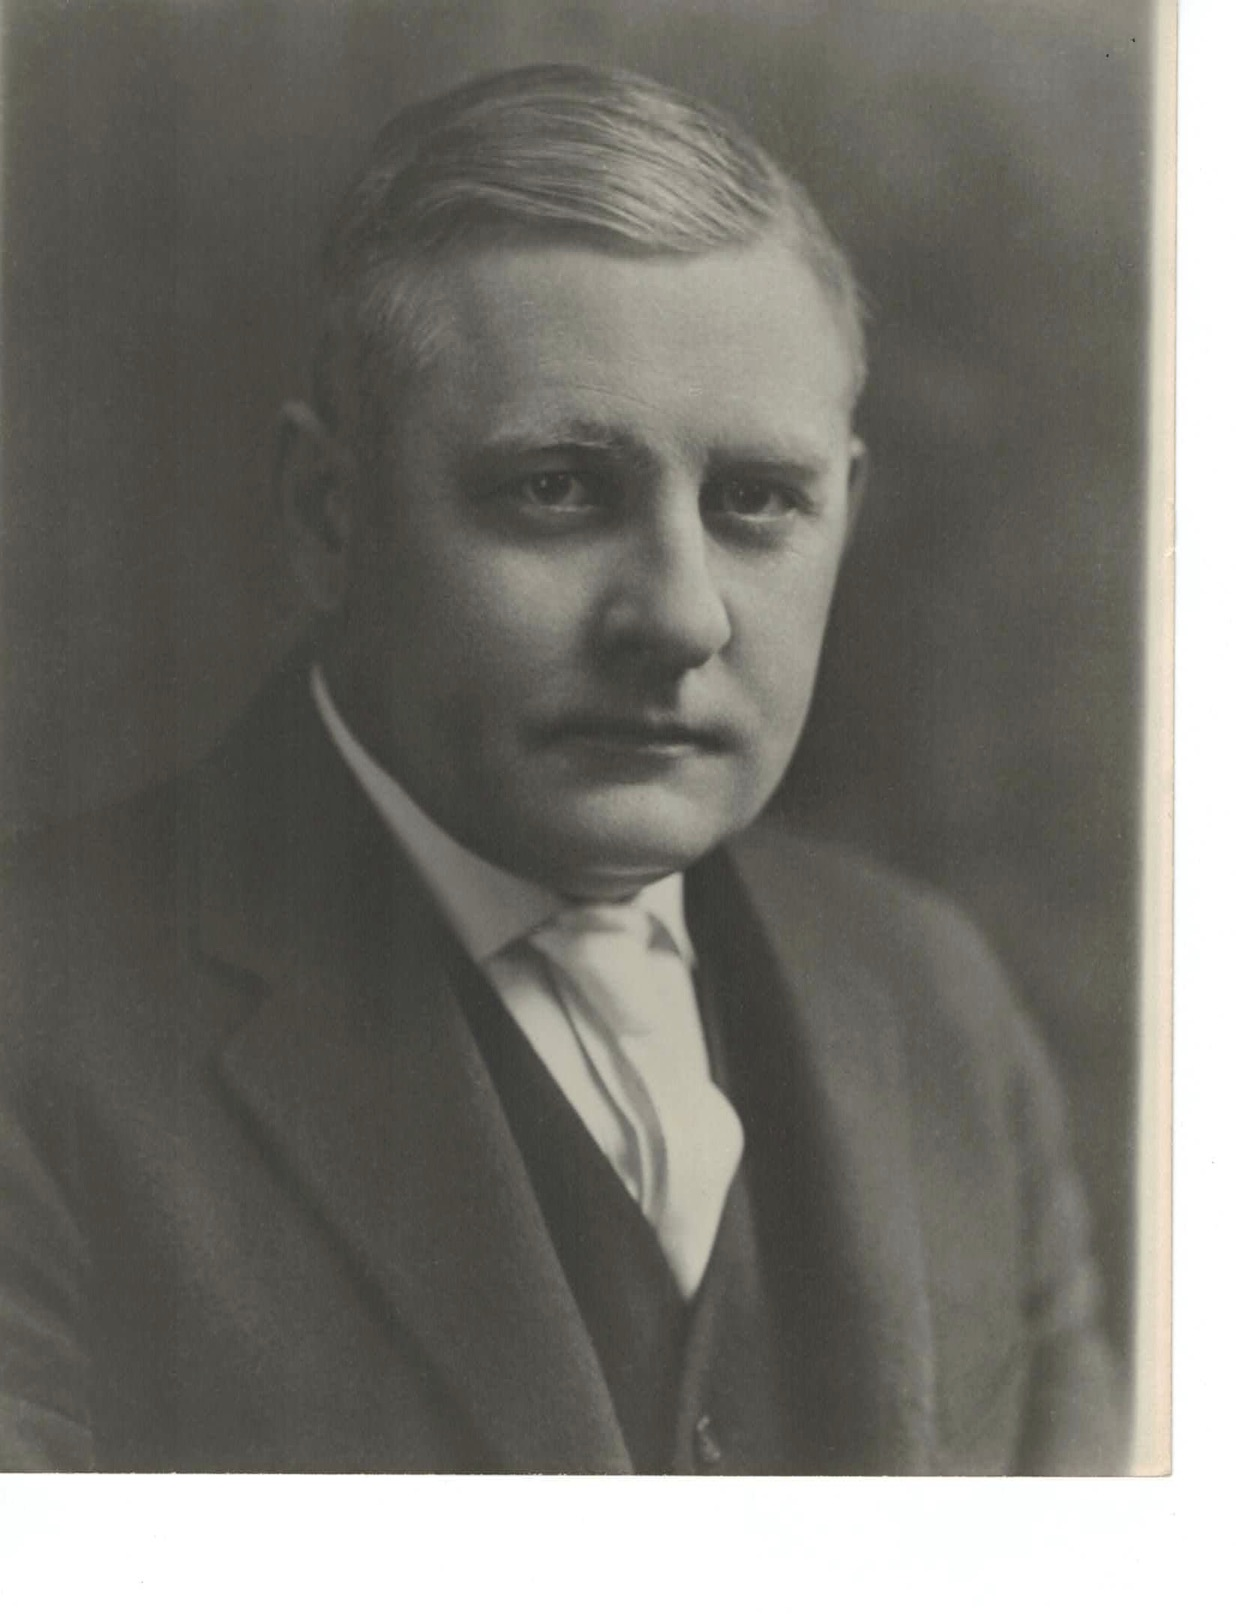 SAMUEL L. BRACKET 1920-21